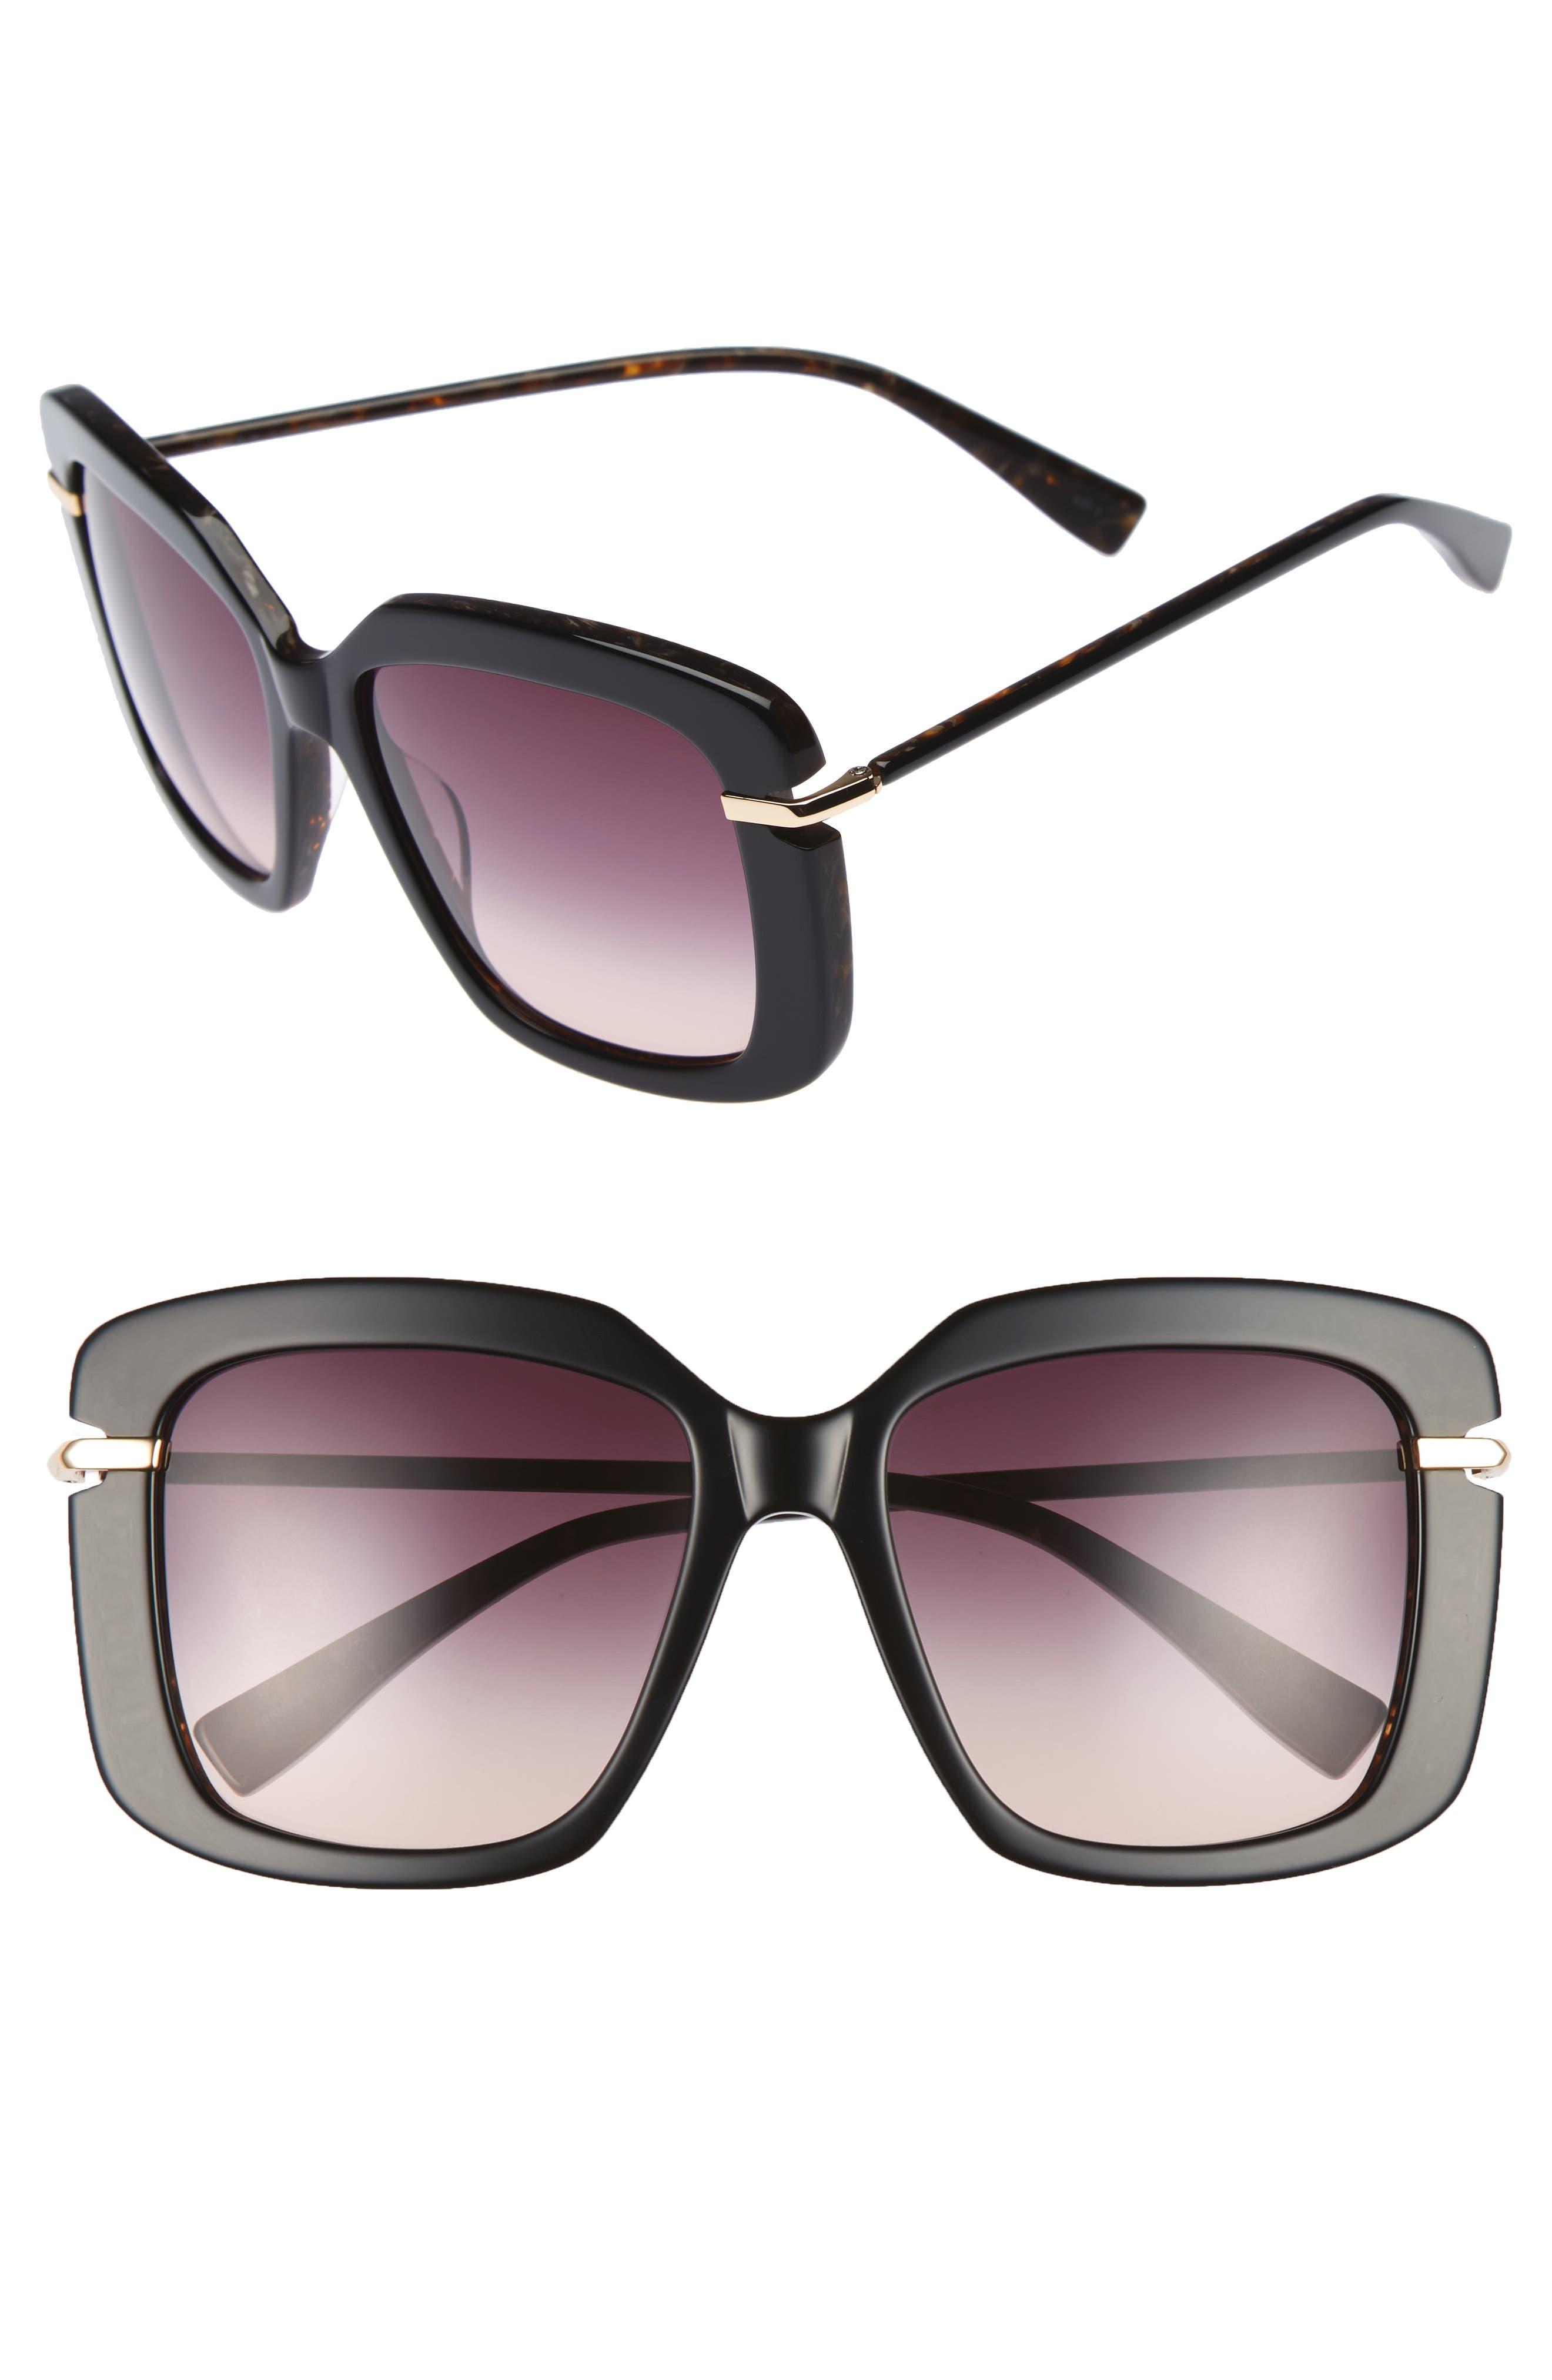 Main Image - Derek Lam Anita 55mm Square Sunglasses